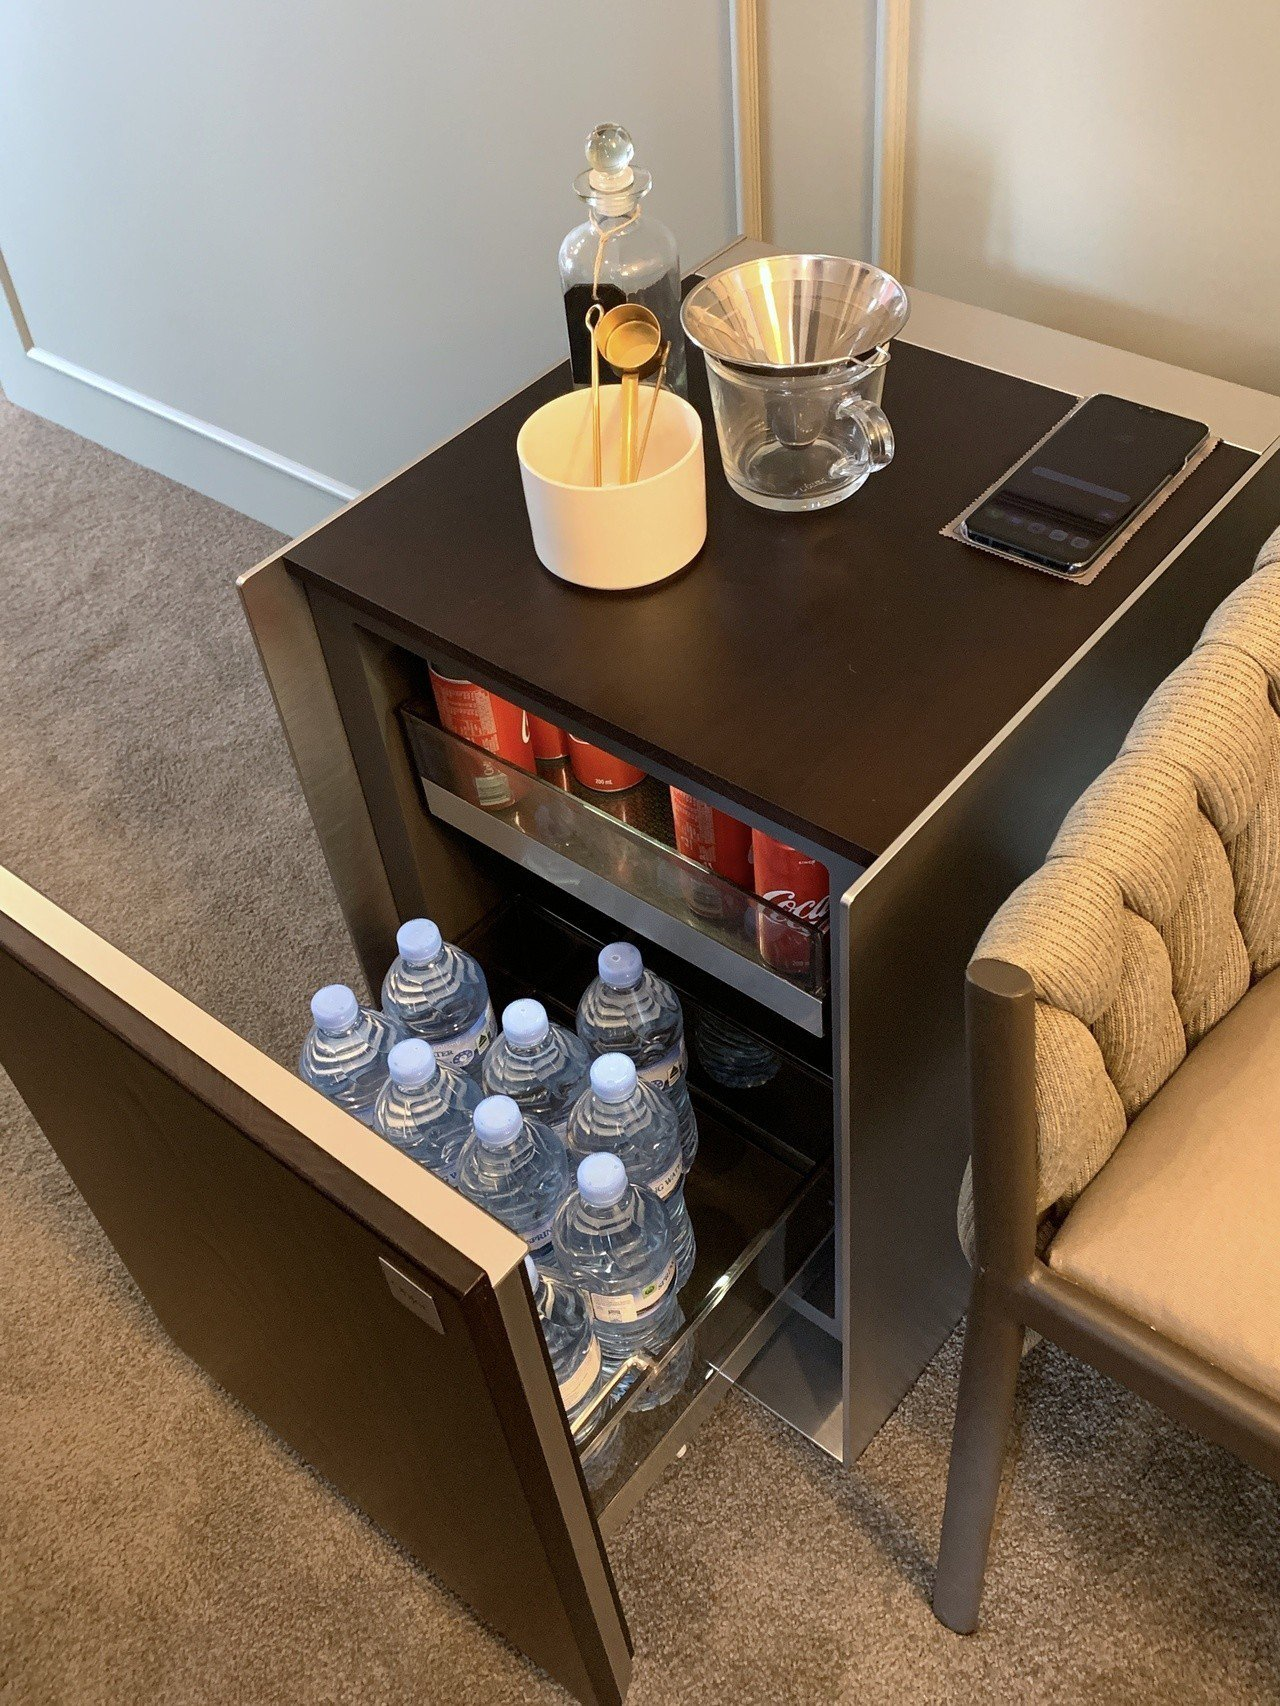 LG Objet系列冰箱,可存放飲料、保養品。記者黃筱晴/攝影